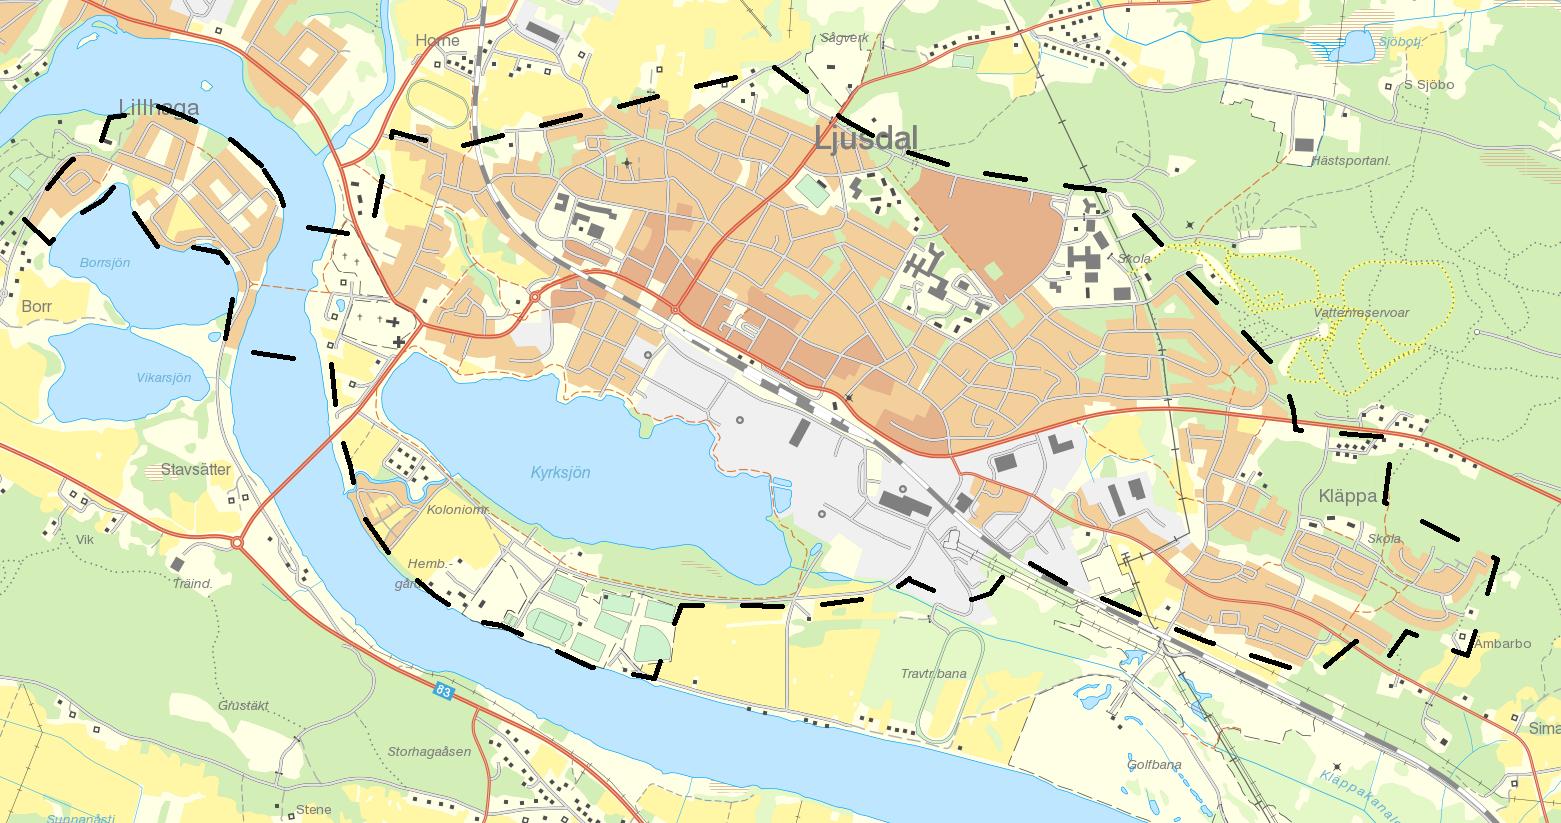 ljusdal karta Snöröjning   Ljusdals kommun ljusdal karta